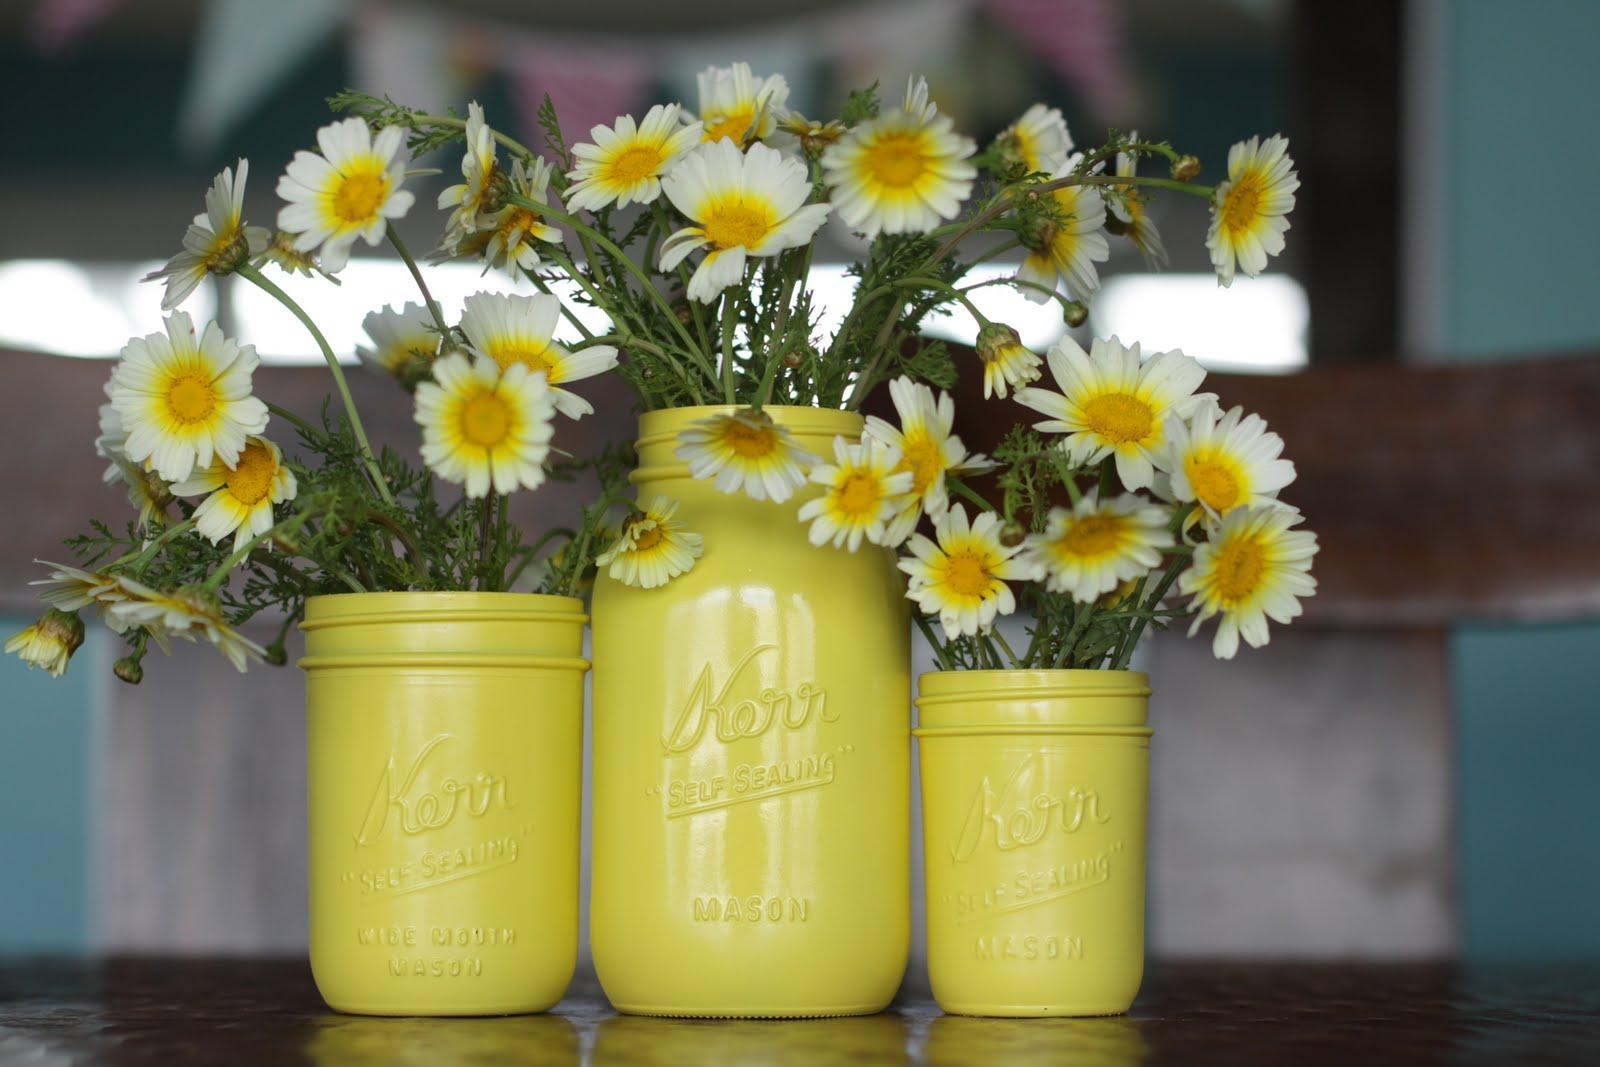 Spray painted mason jar inspiration yarn yummies for How to paint glass jars ideas